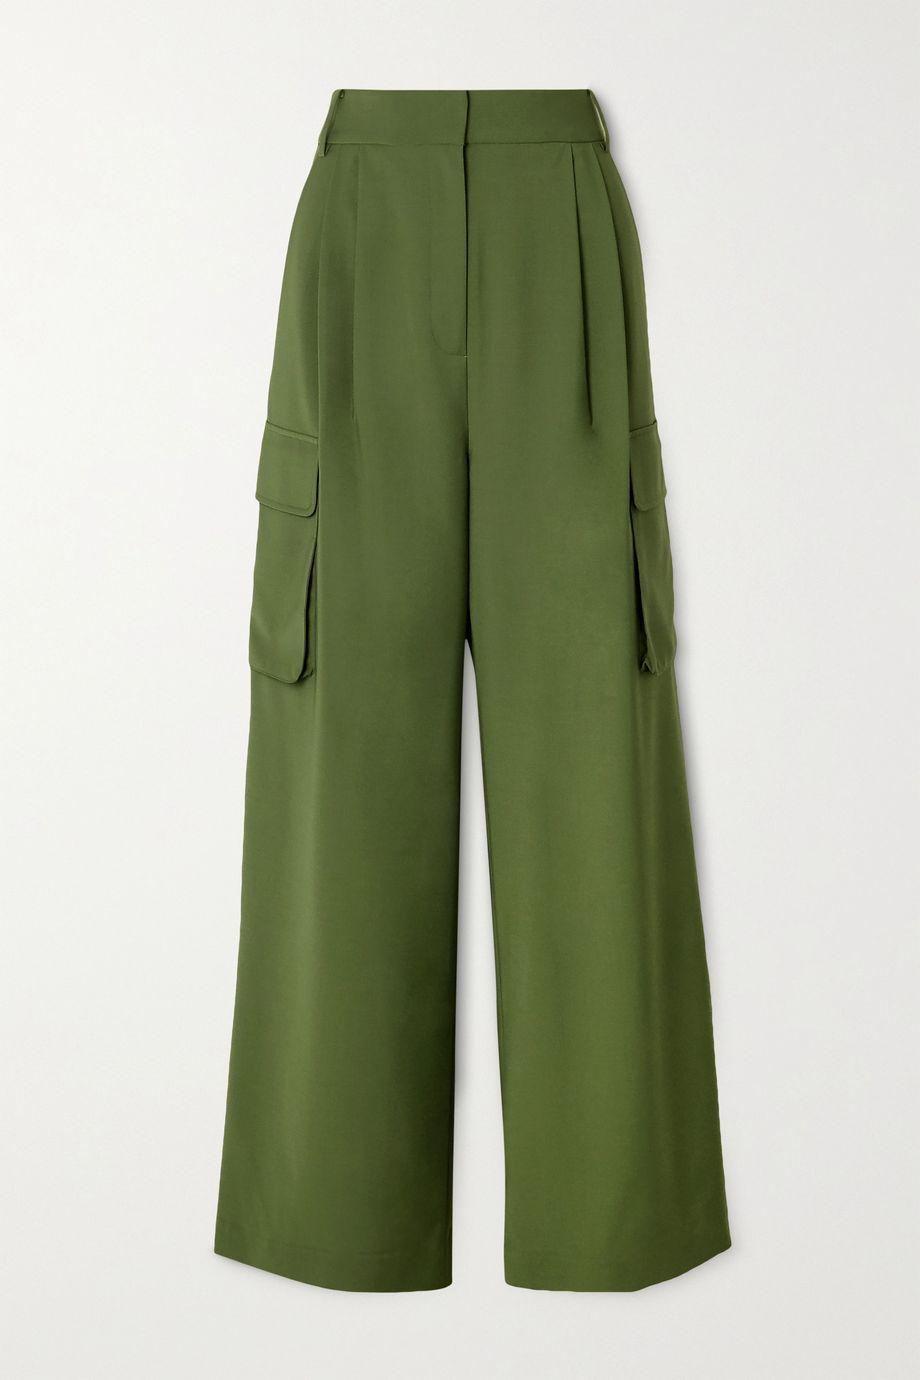 Tibi Tropical pleated woven wide-leg pants